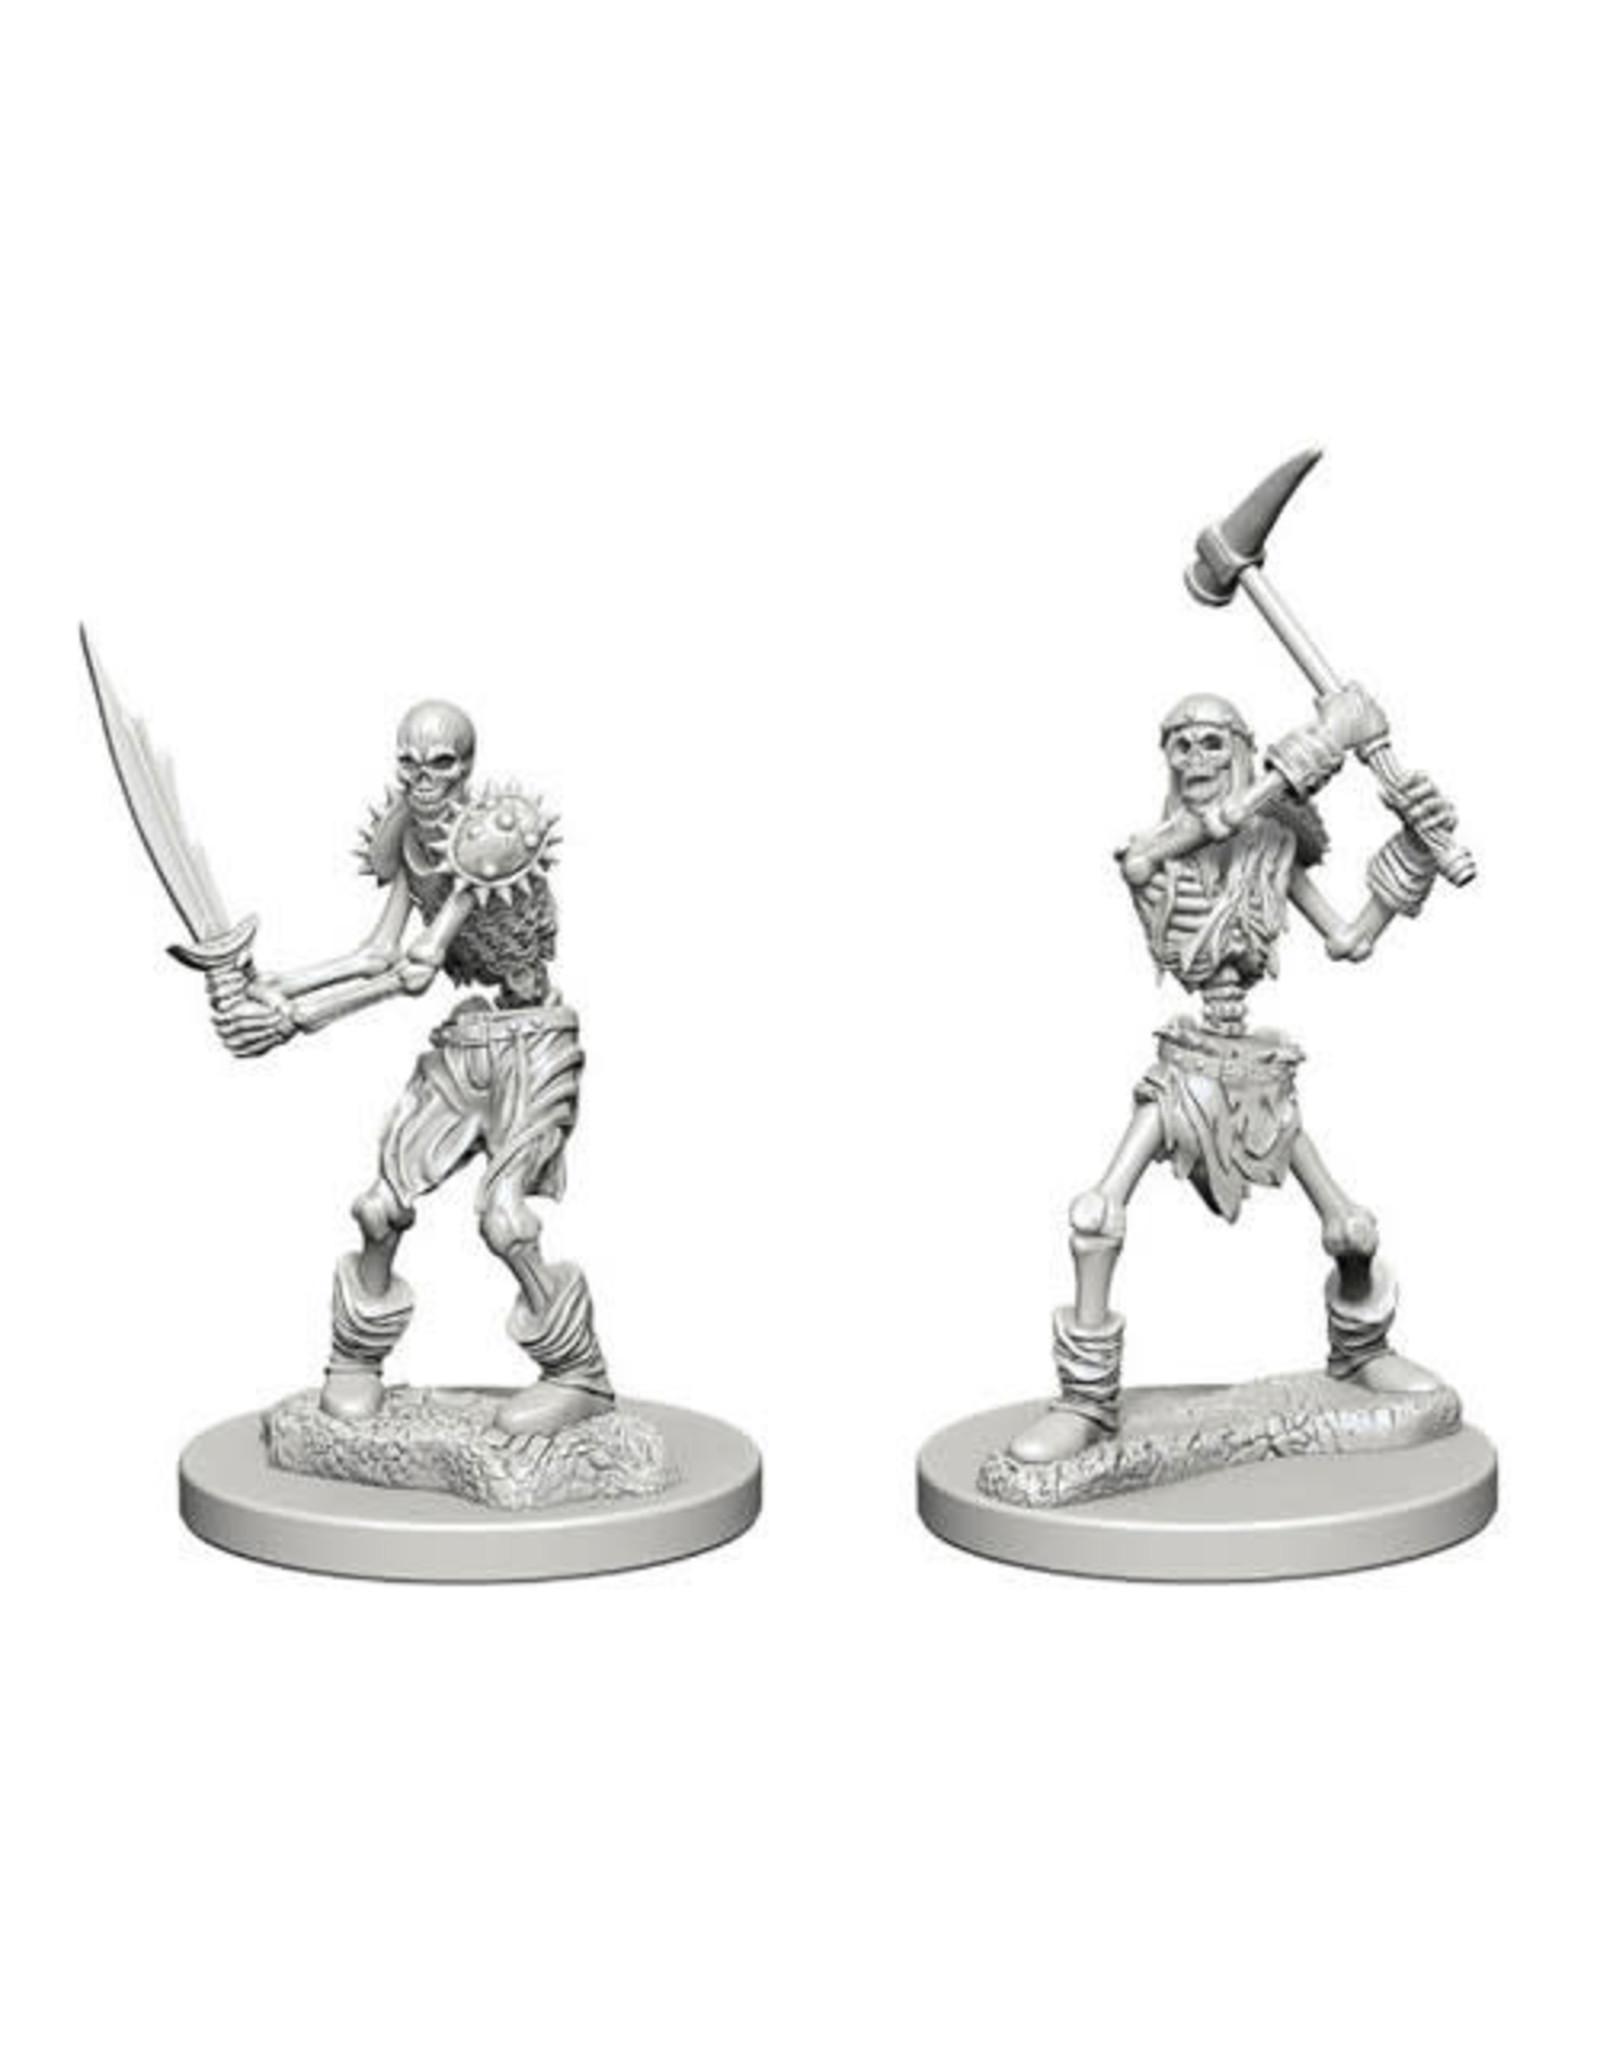 D&D Unpainted Minis: Skeletons